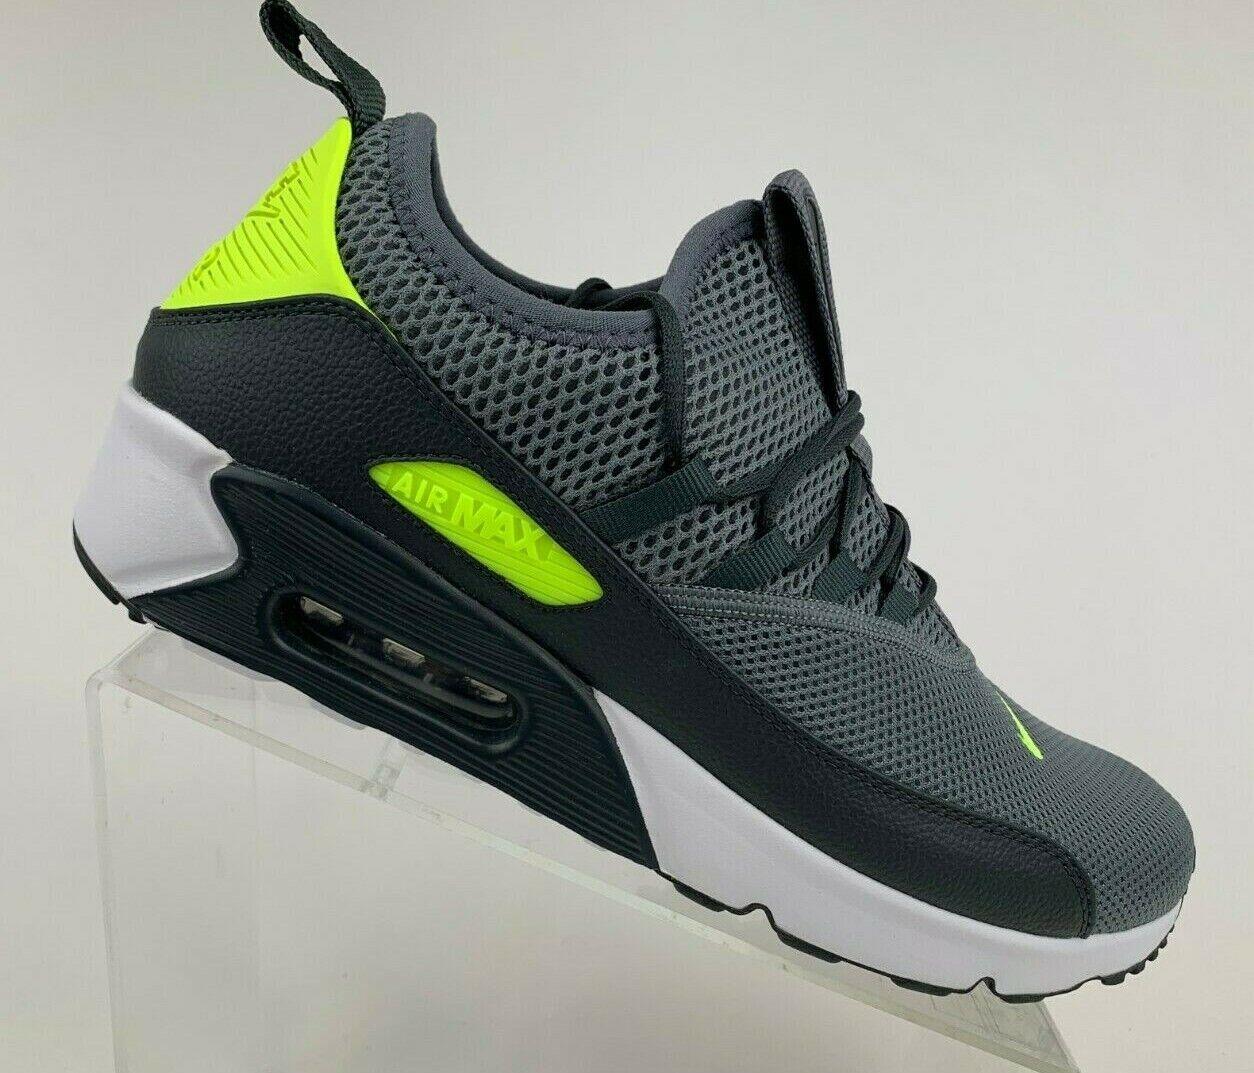 Nike Air Max 90 EZ Cool GreyVolt Anthracite Men's Shoes AO1745 003 Multi SZ